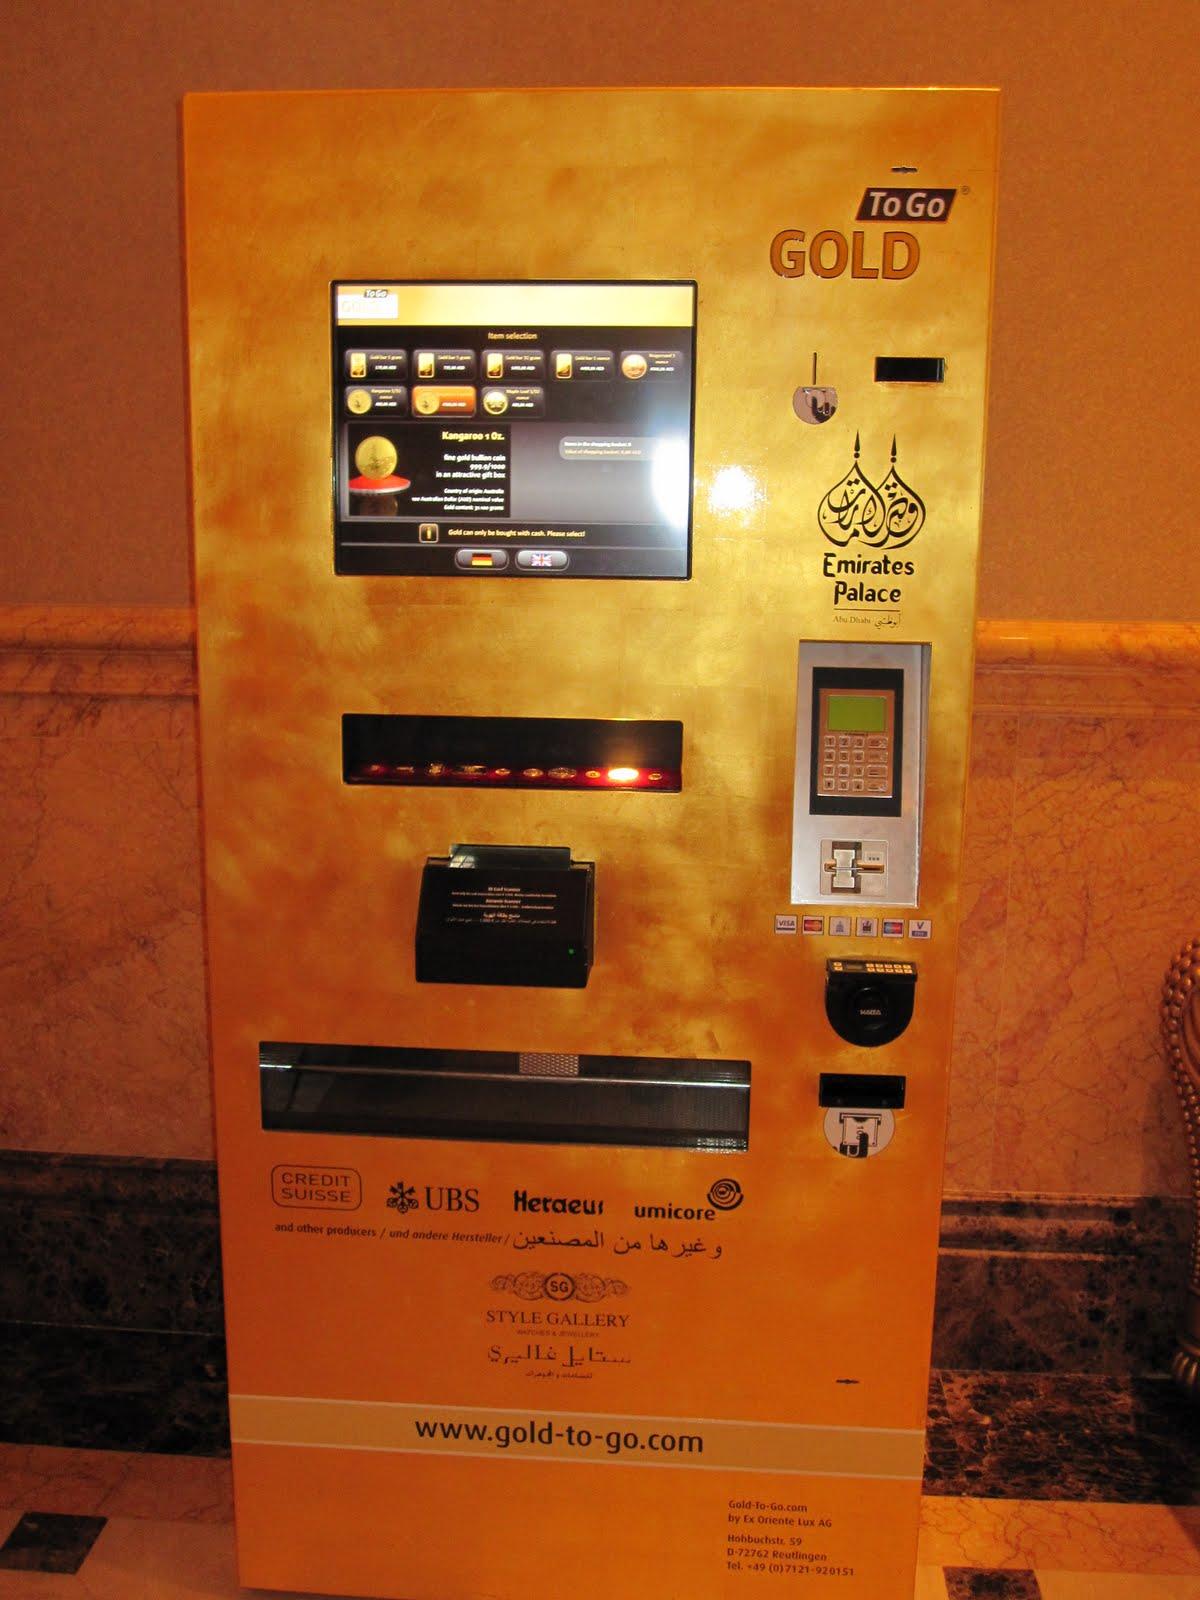 Emirates Palace Gold Atm